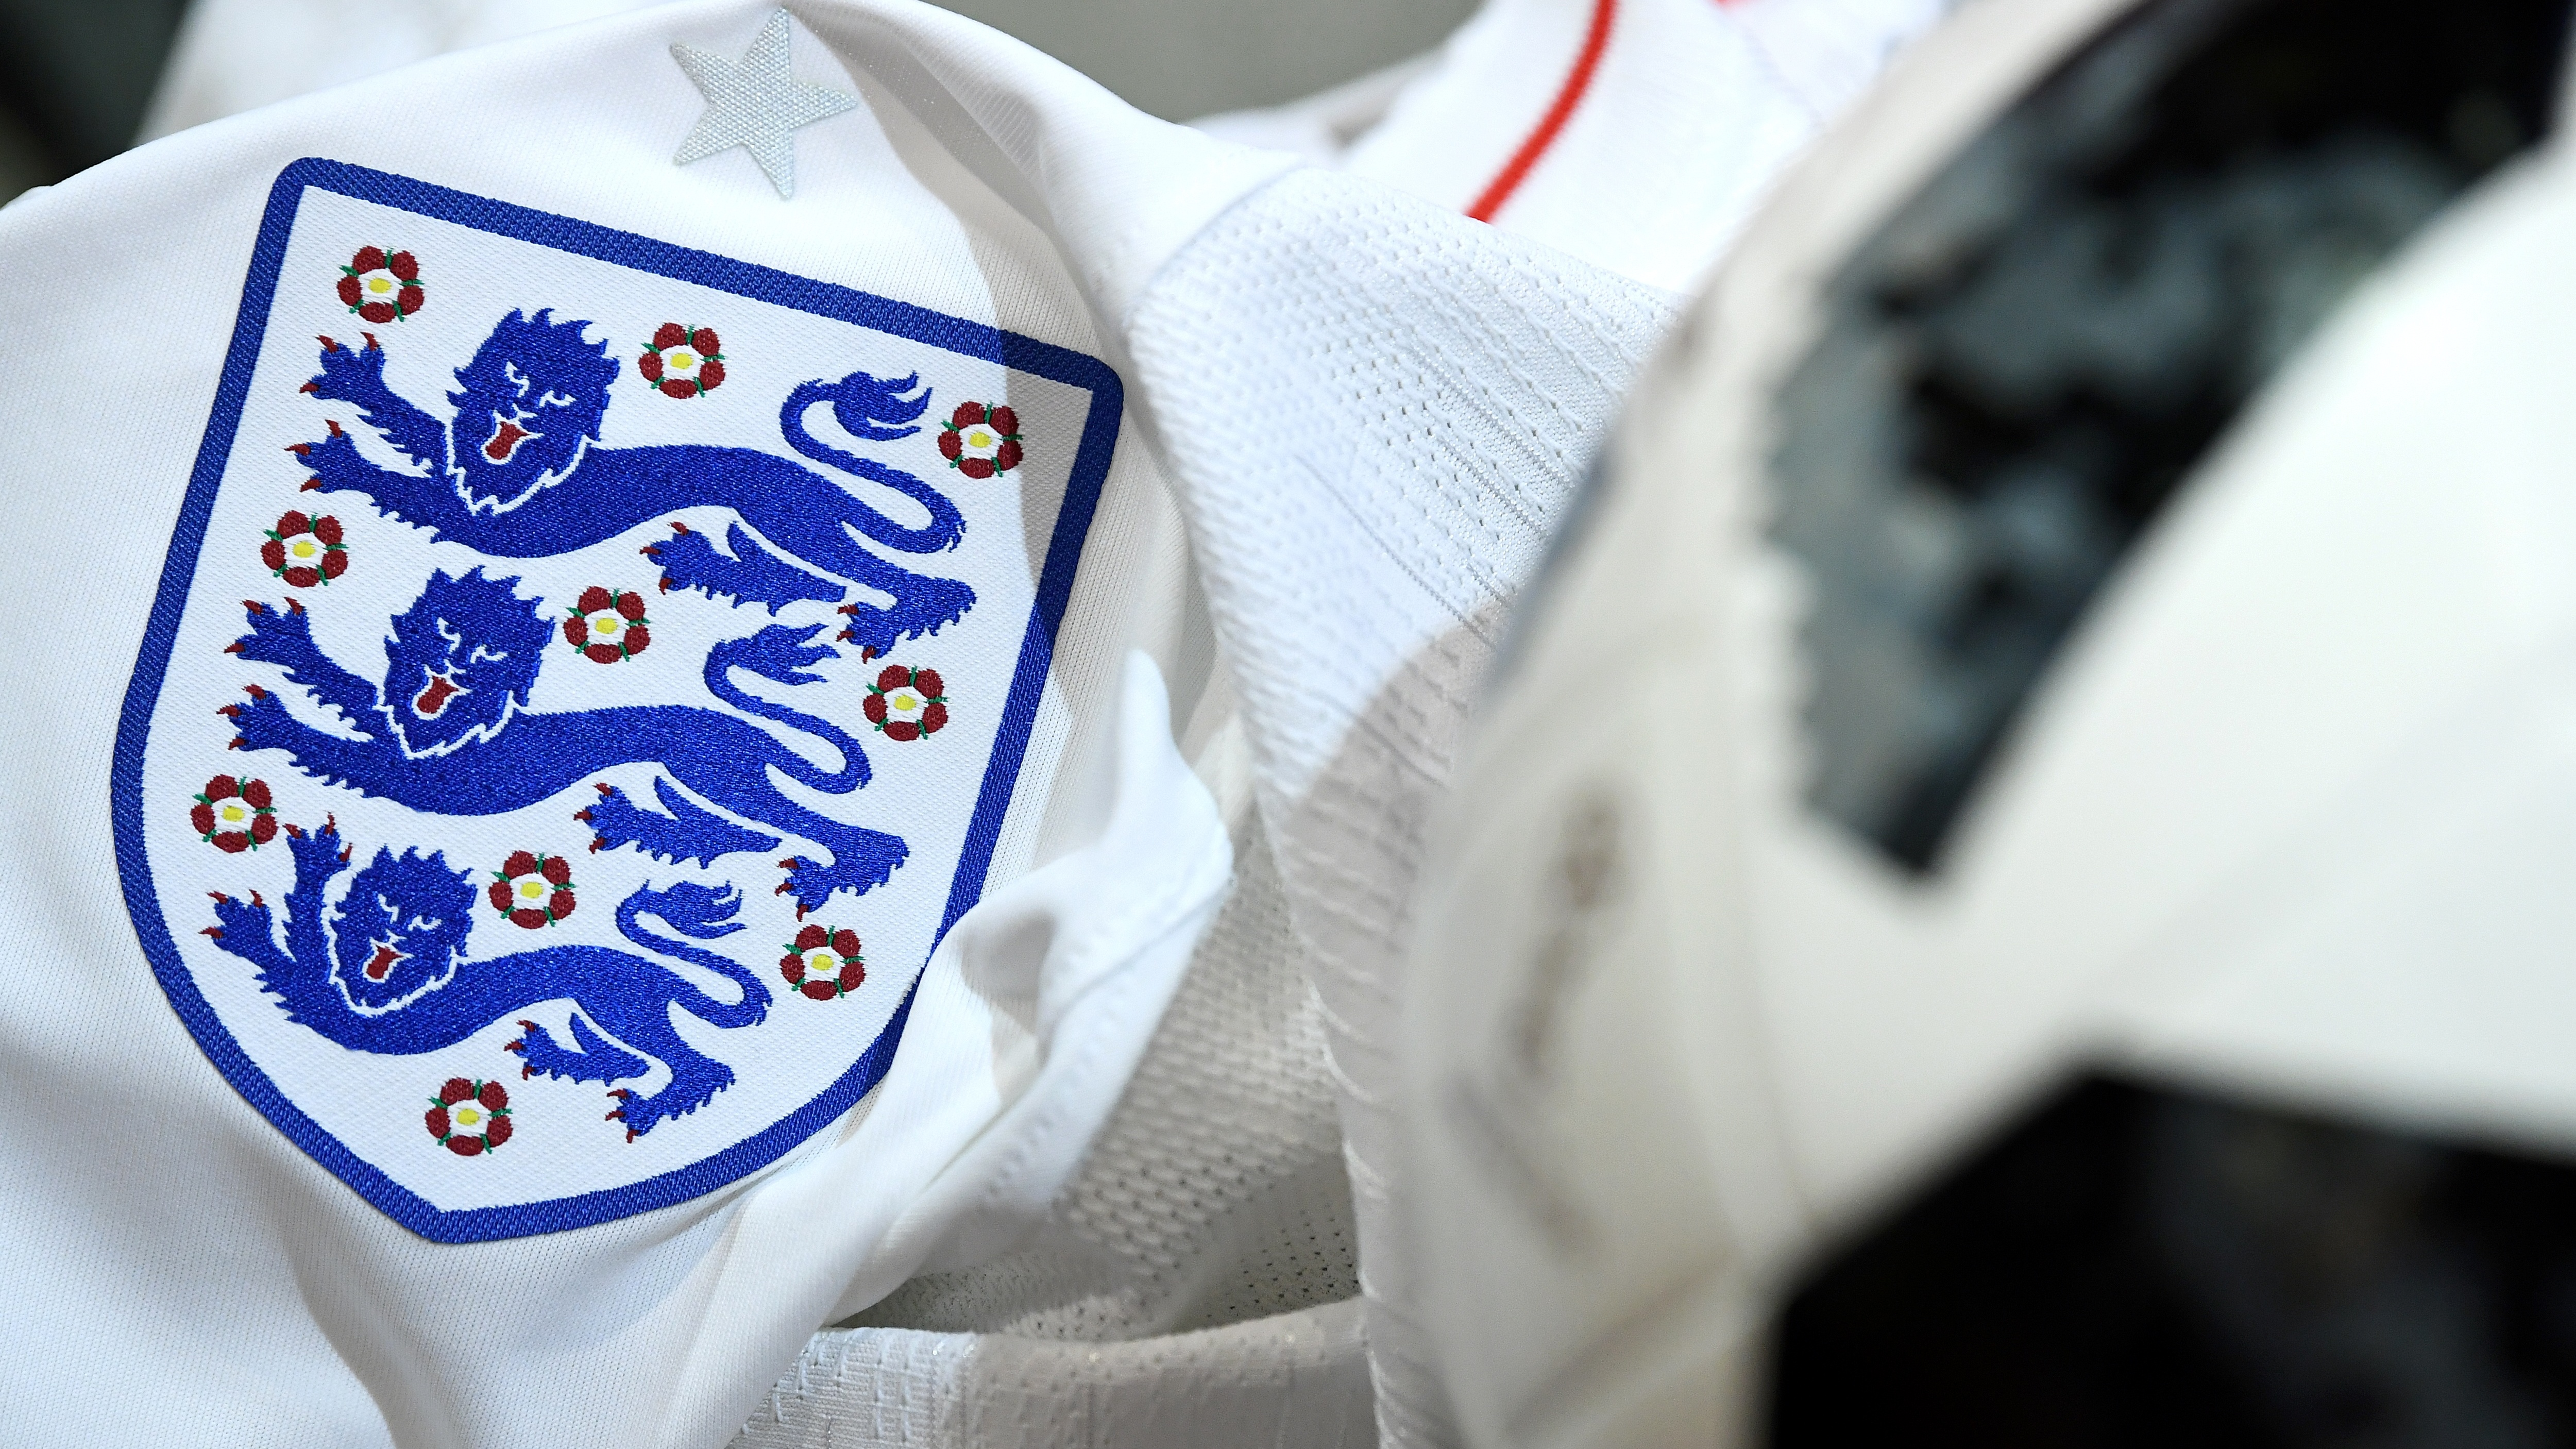 Piala Dunia 2018: Salam ala Nazi Mencoreng Wajah Inggris